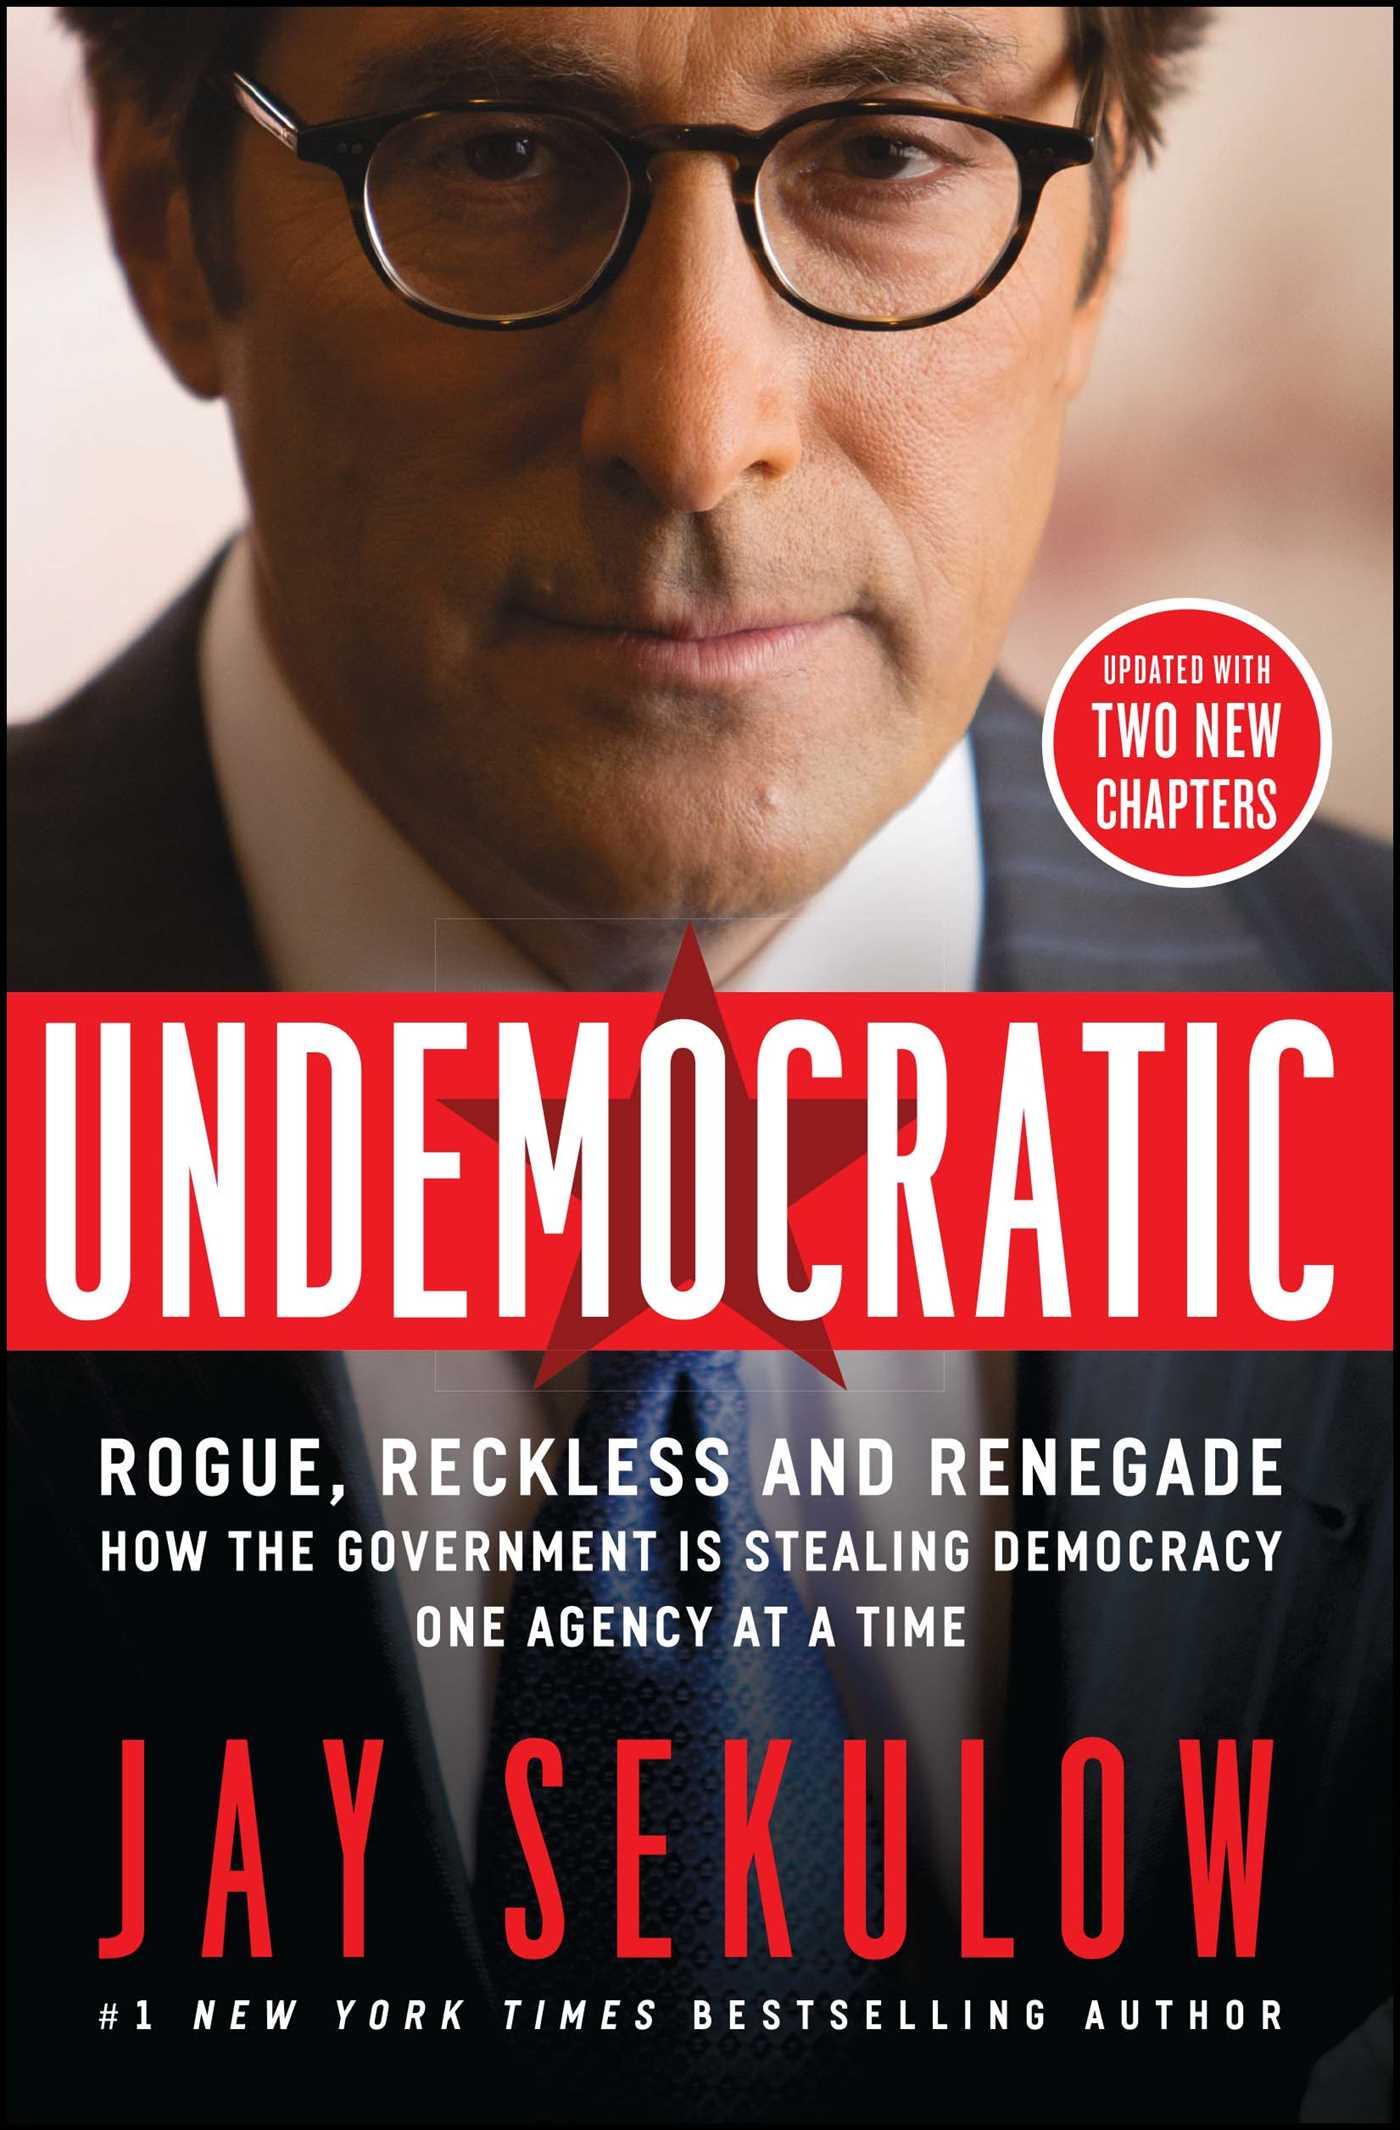 Jay Sekulow – Undemocratic